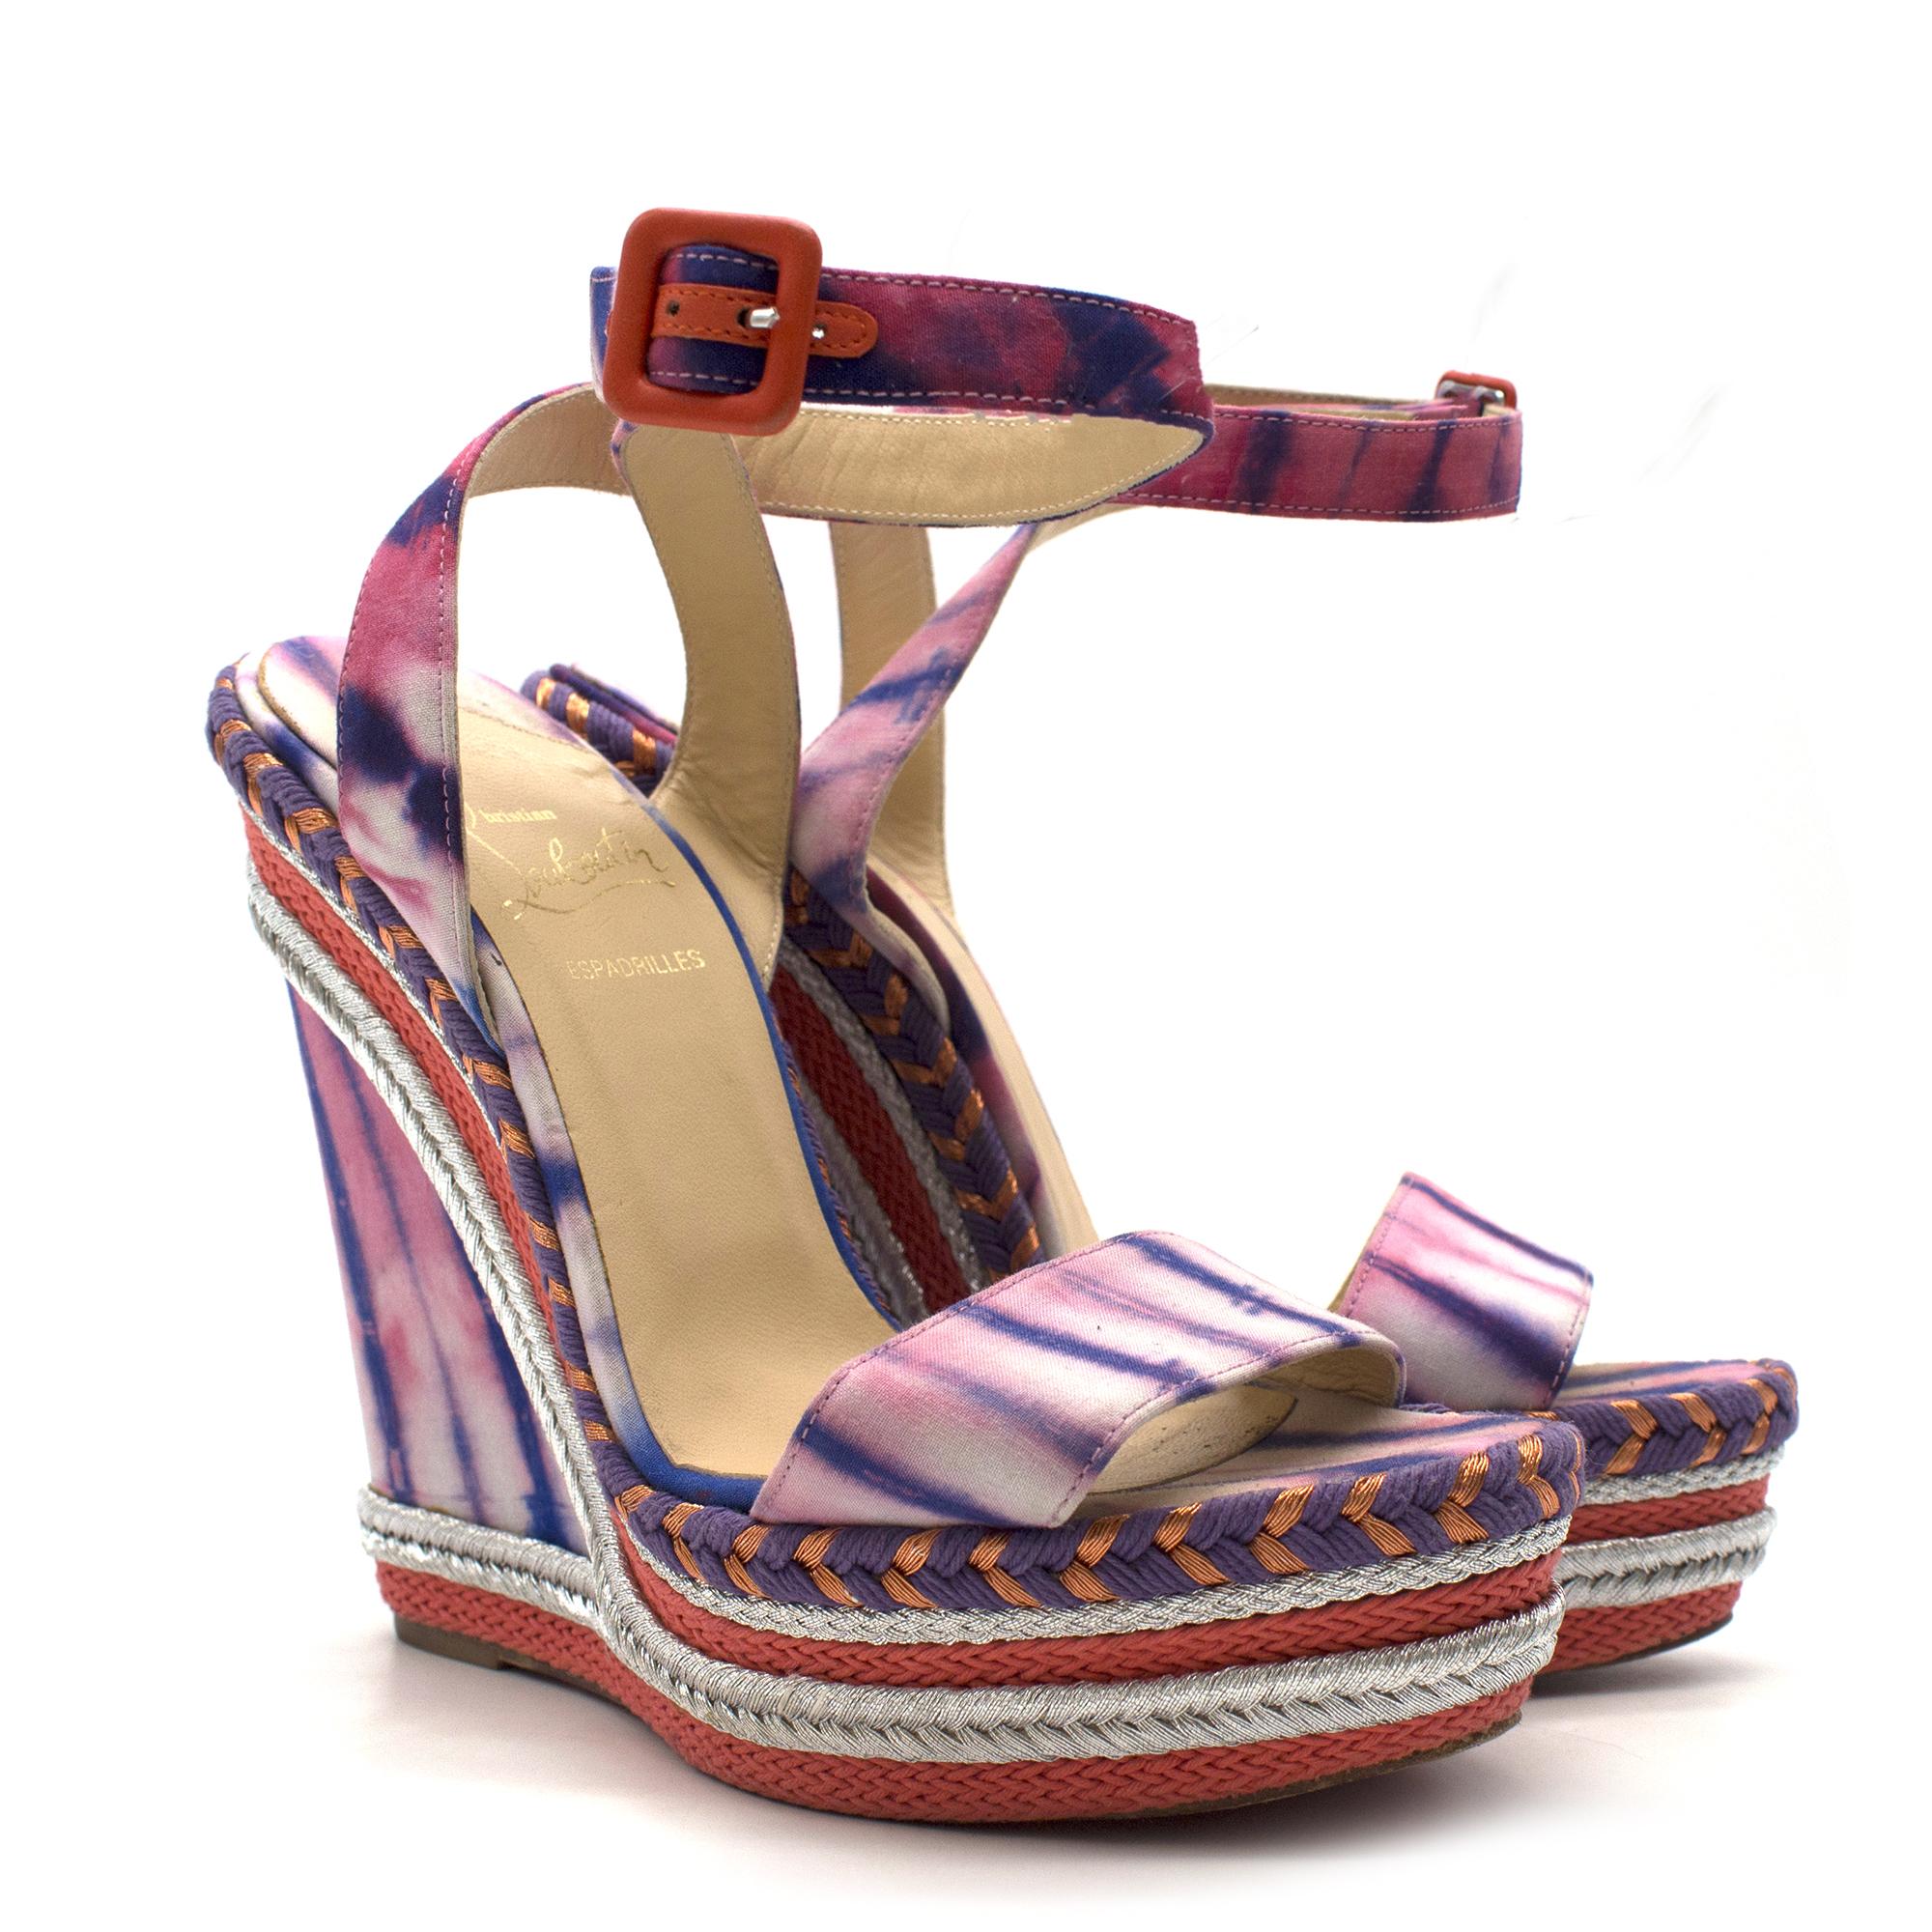 Christian Louboutin Duplice Tie-Die Espadrille Wedge Sandals